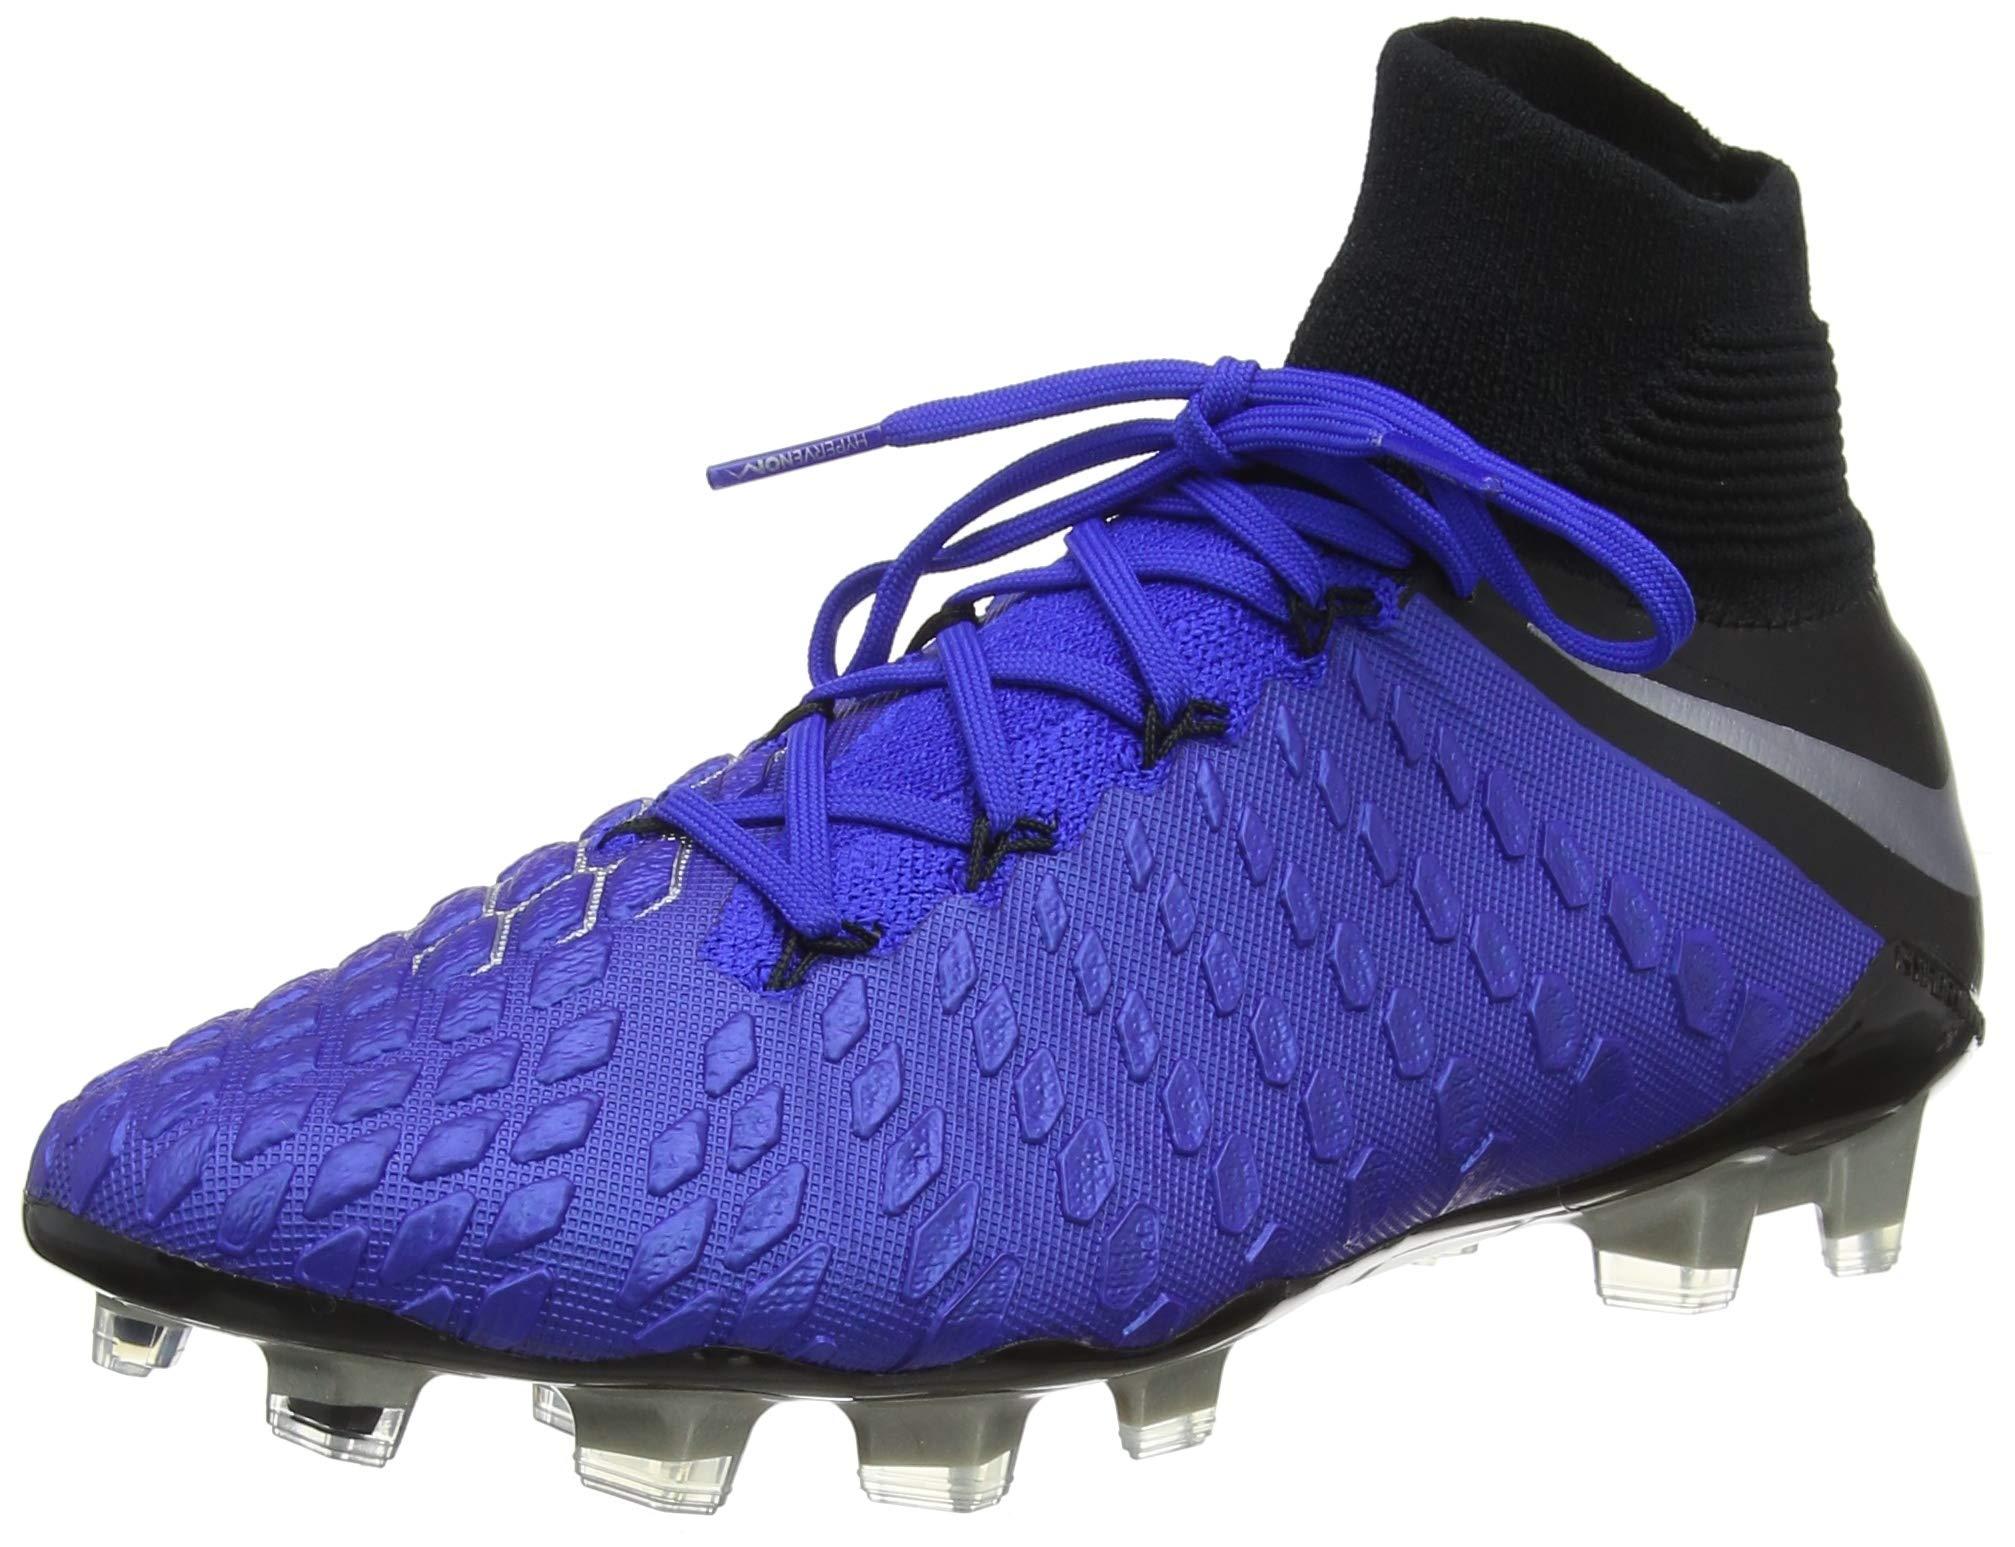 0ebd84800 Nike Hypervenom Phantom III Elite Dynamic Fit Soccer Cleats (M8/W9.5,